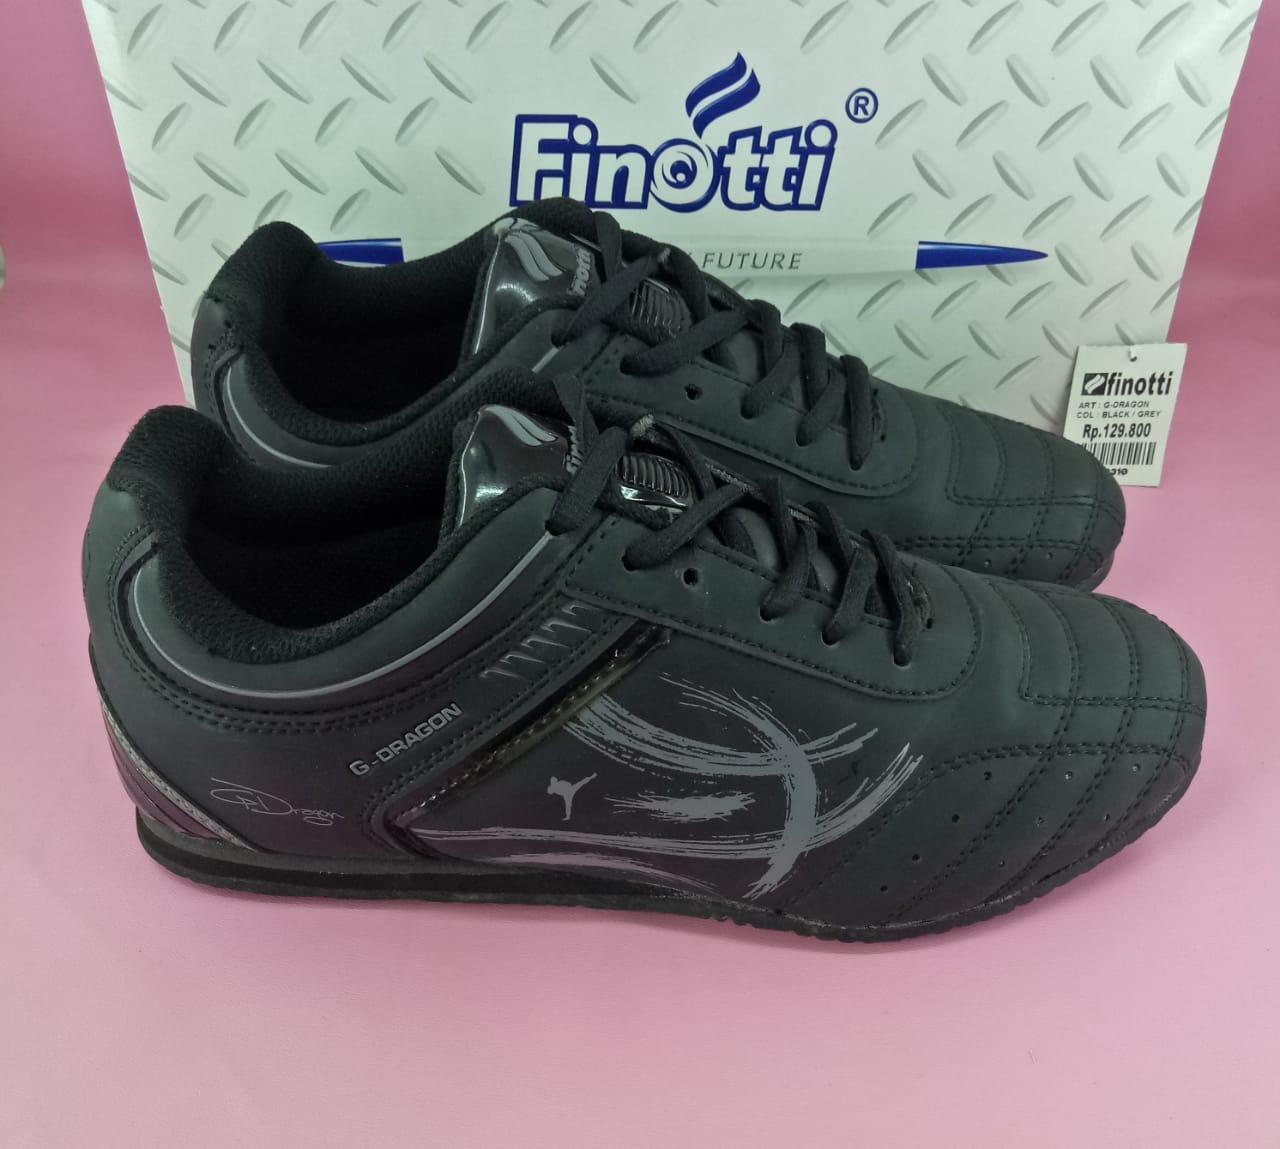 Finotti Sandal Gunung Pria Jordi 3 Blacknavy Daftar Harga Terbaru Kross Black White Size 42 50000 Promo Sepatu